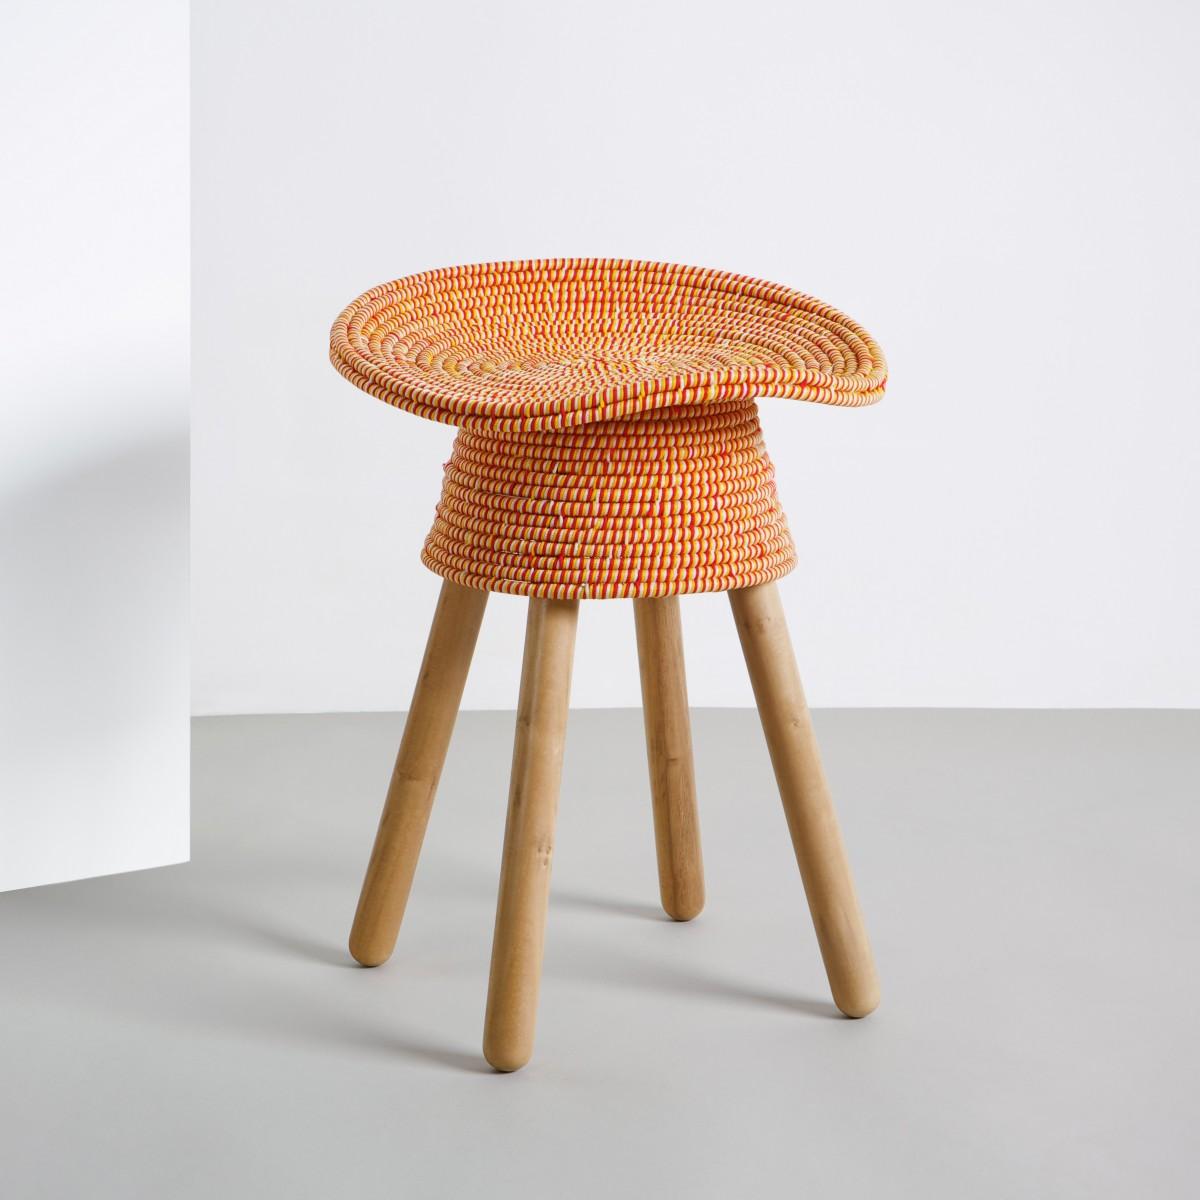 880240-505-coiled_stool-001_2.jpg